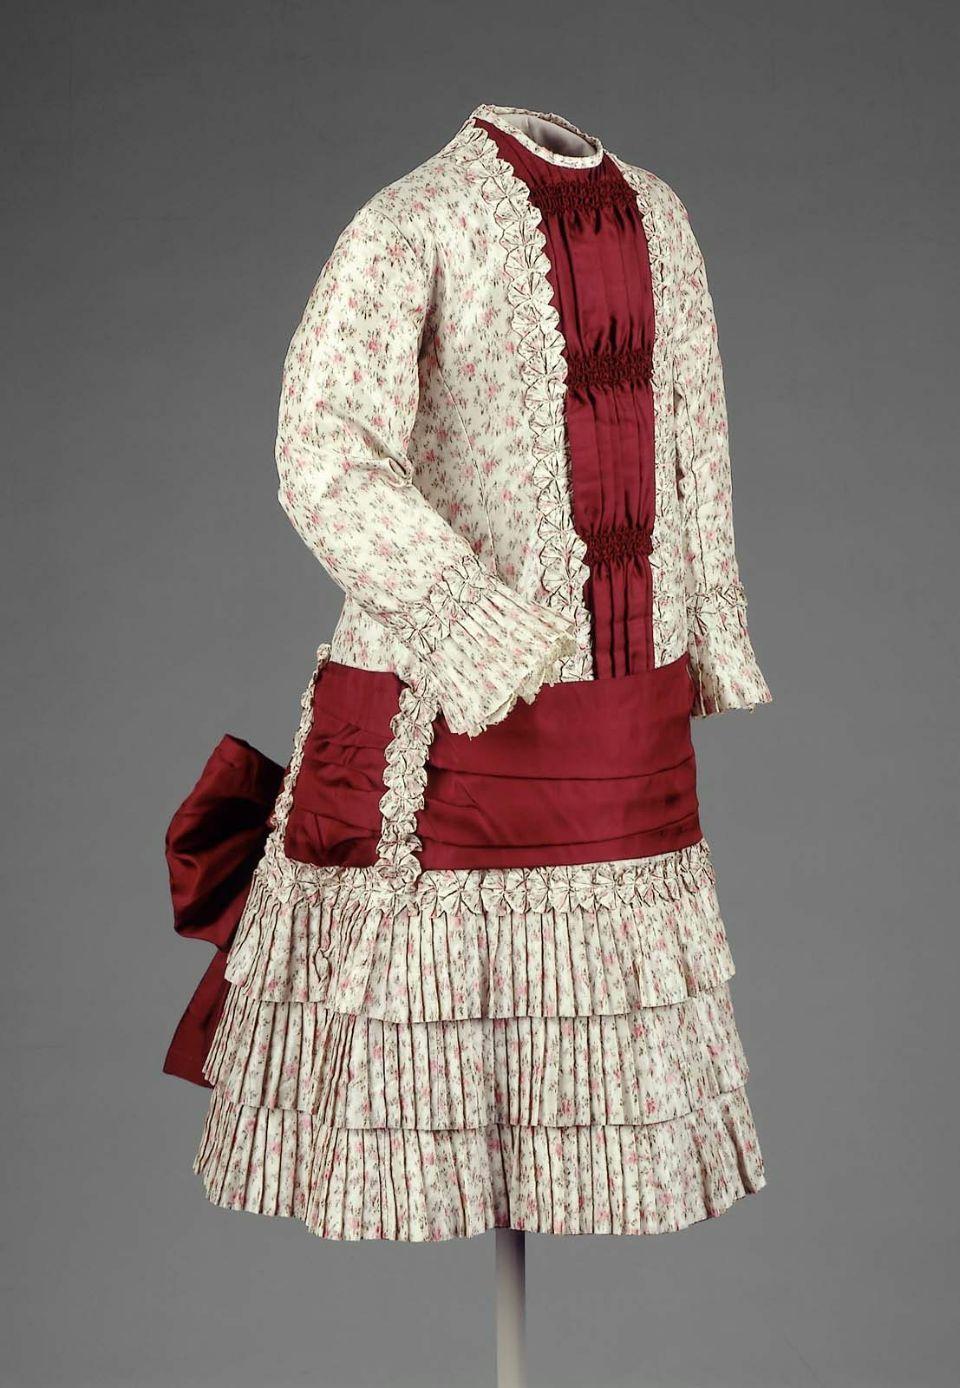 Girl's dress, warp-printed silk taffeta and red silk twill with metal buttons, c. 1883, American.